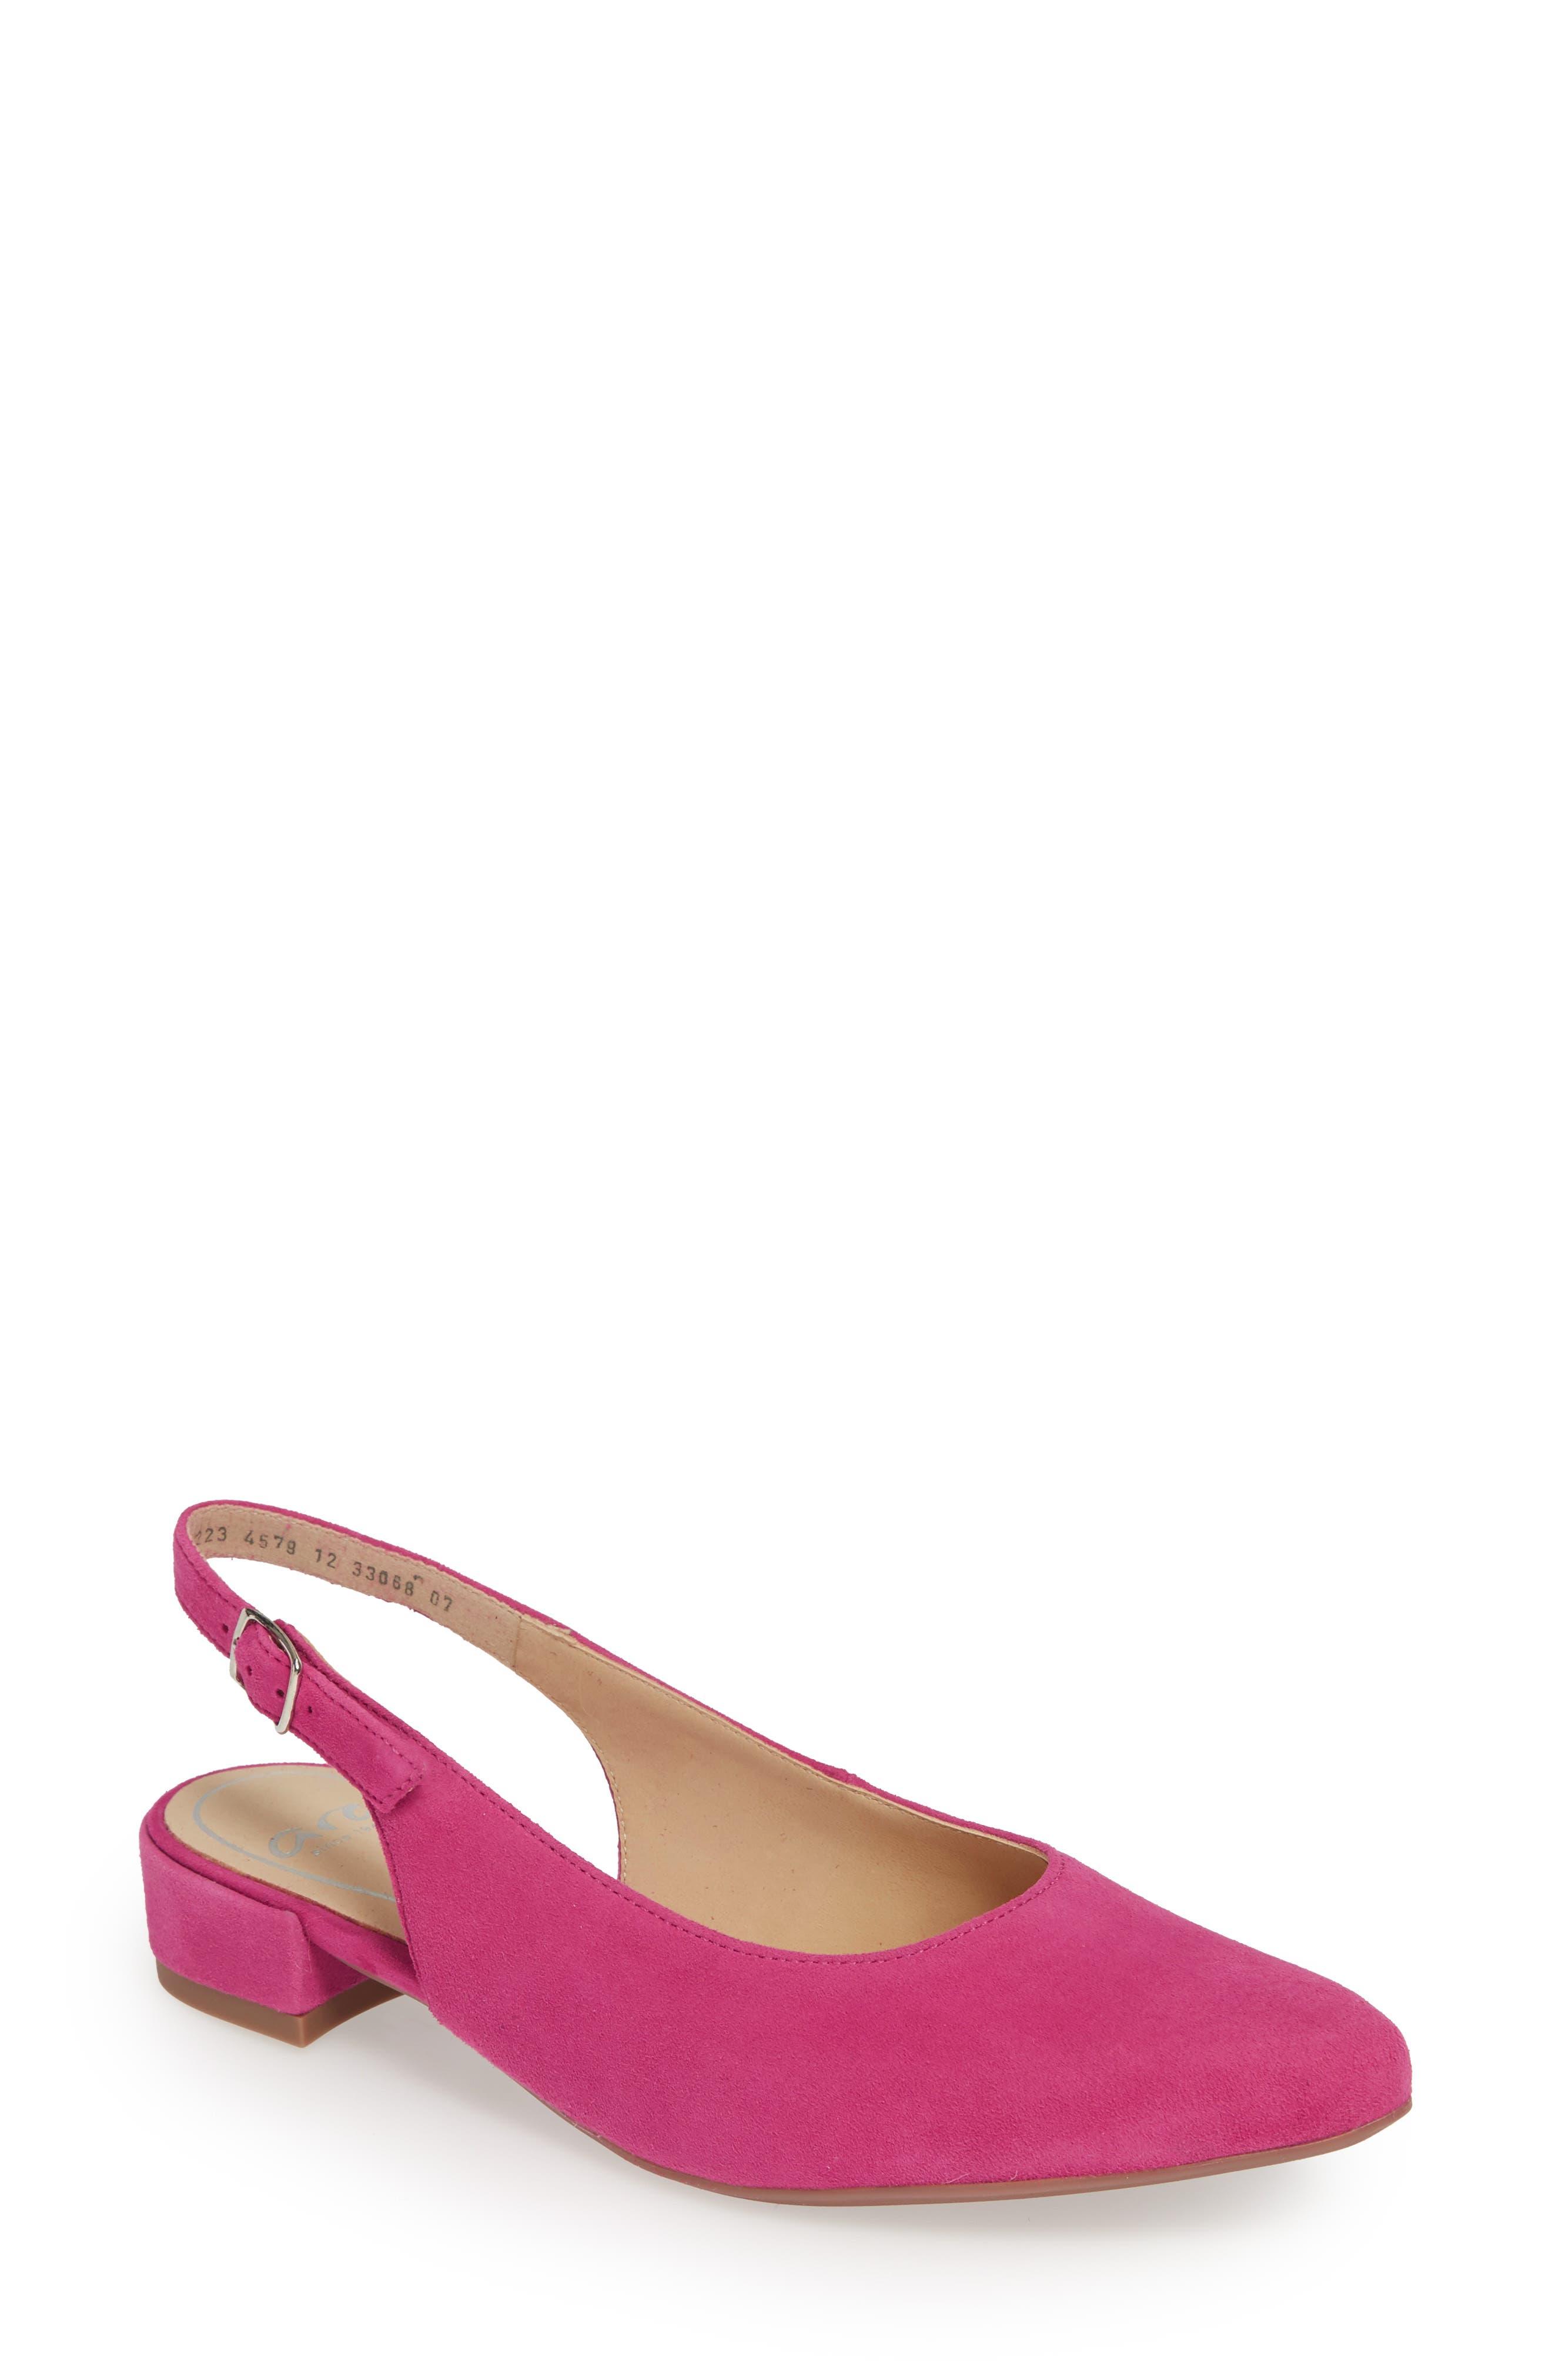 Ara Pixie Slingback Pump, Pink